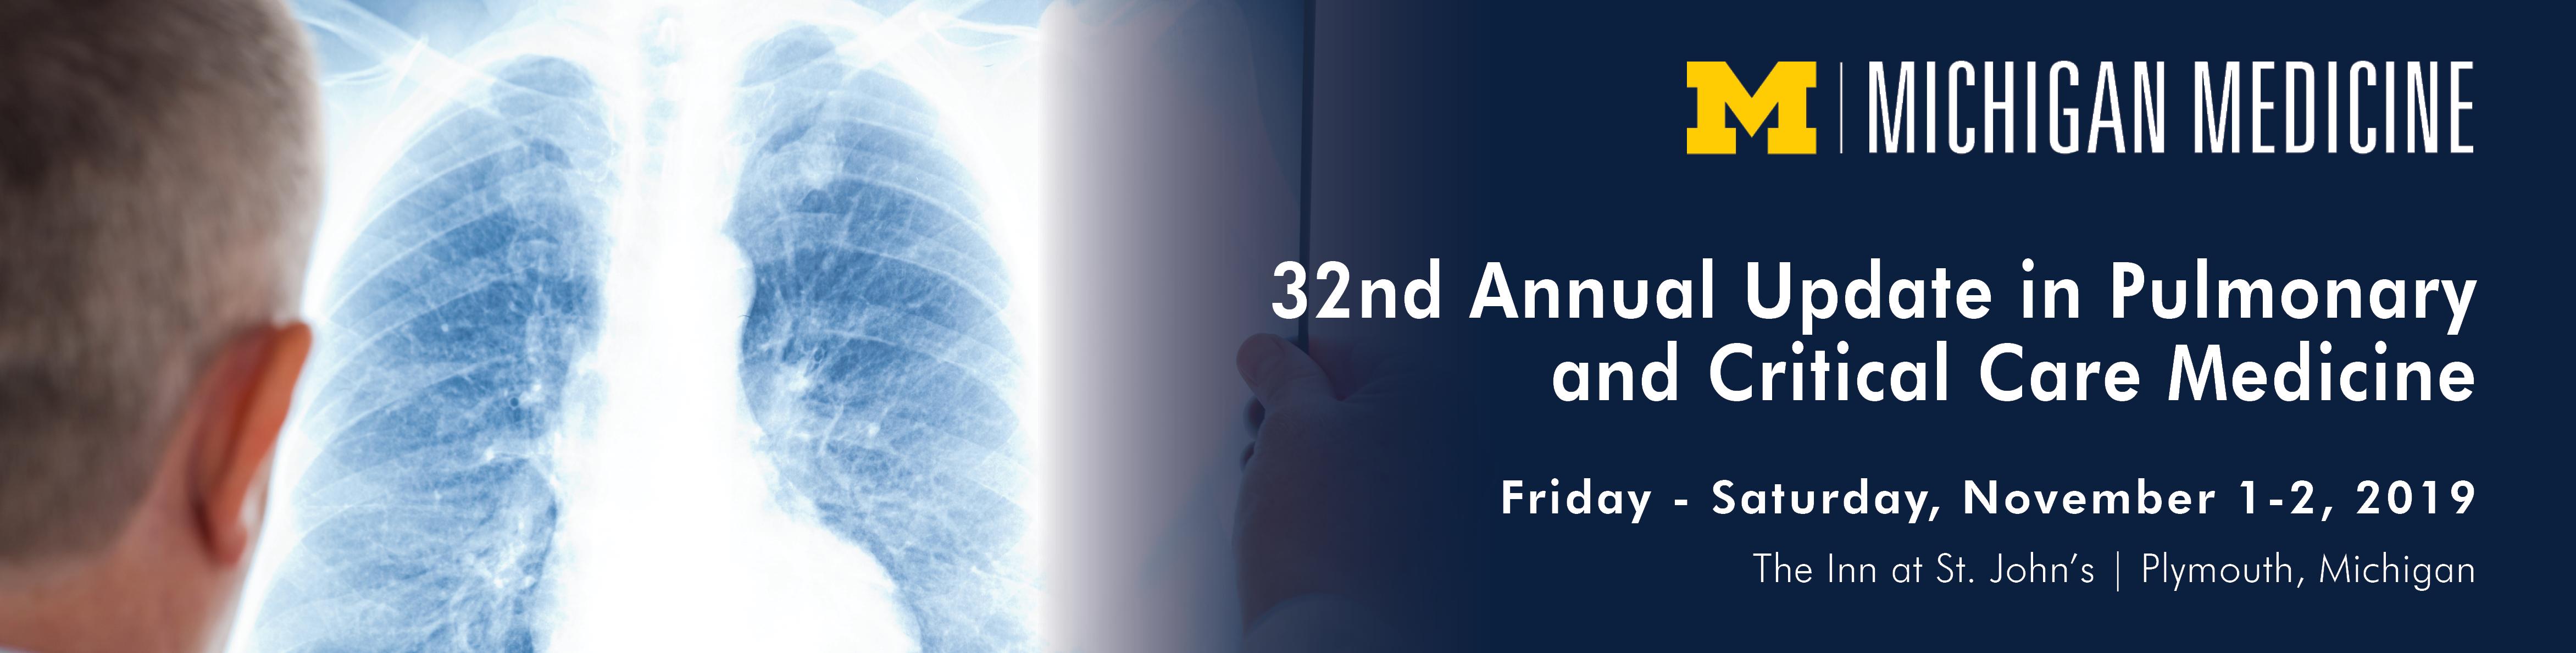 32nd Annual Update in Pulmonary and Critical Care Medicine